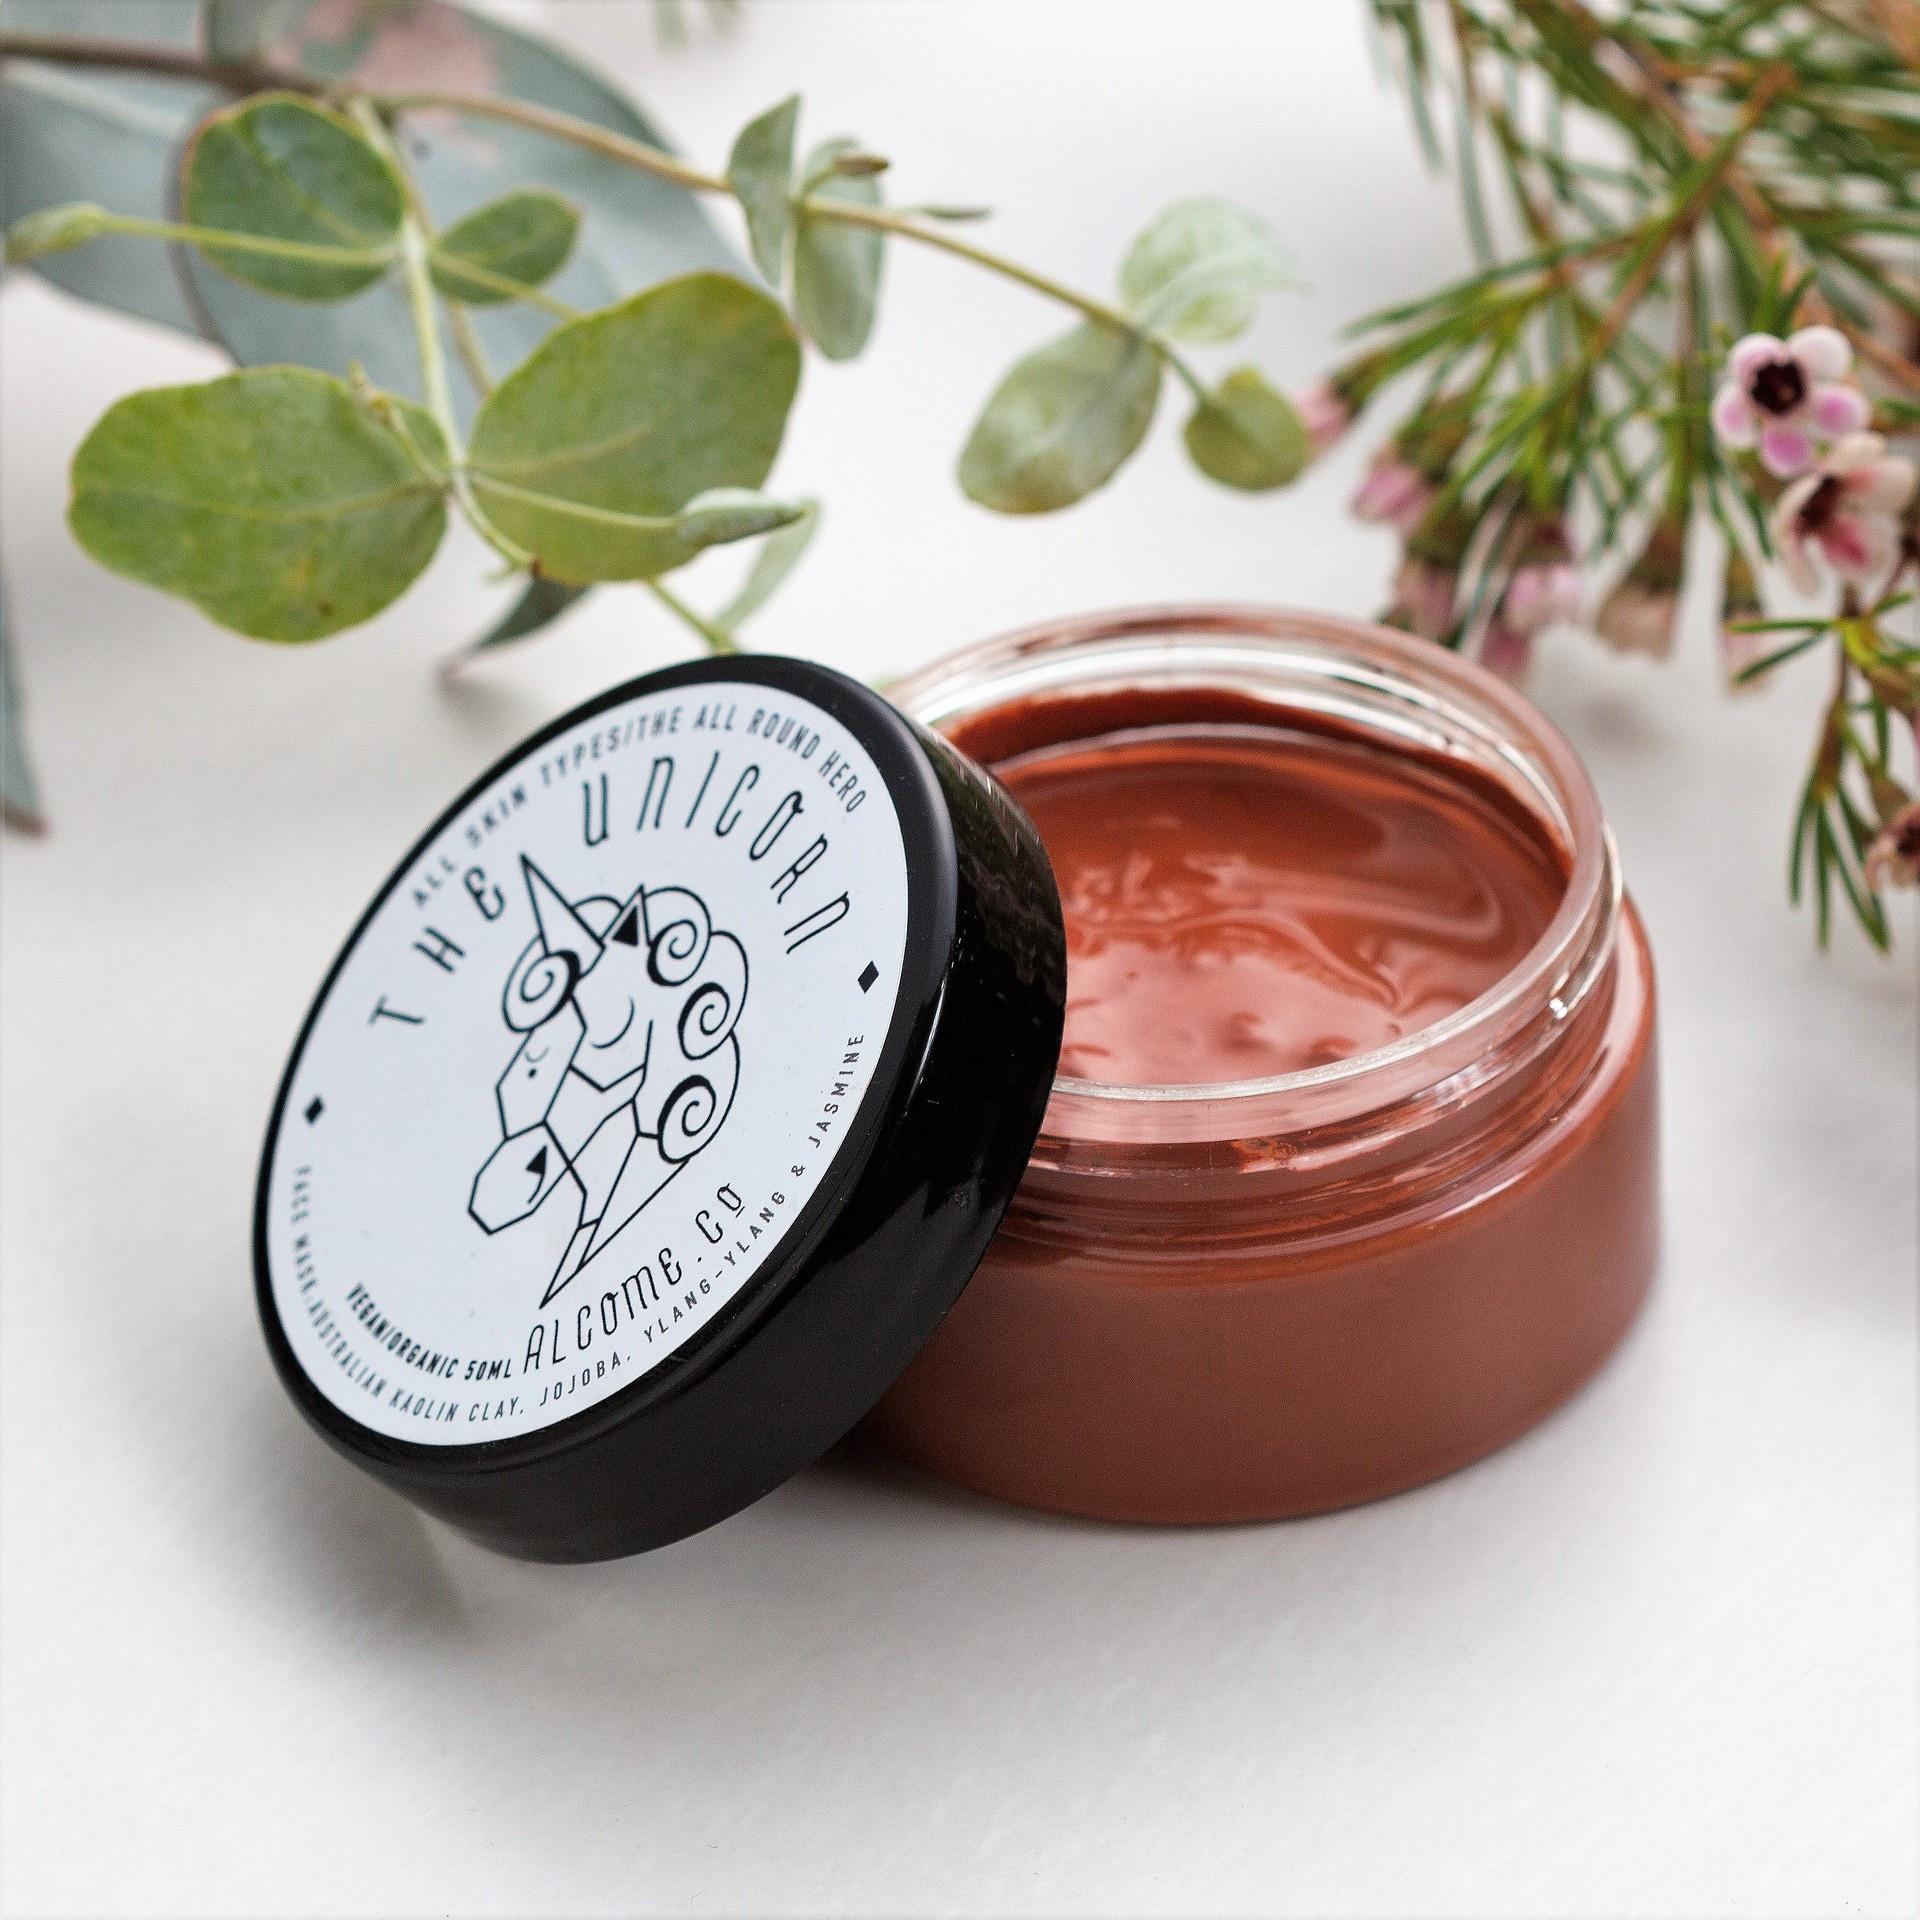 Luxe Clay Mask / Skin Brightening Facemask / Vegan Organic Natural / All Skin Types